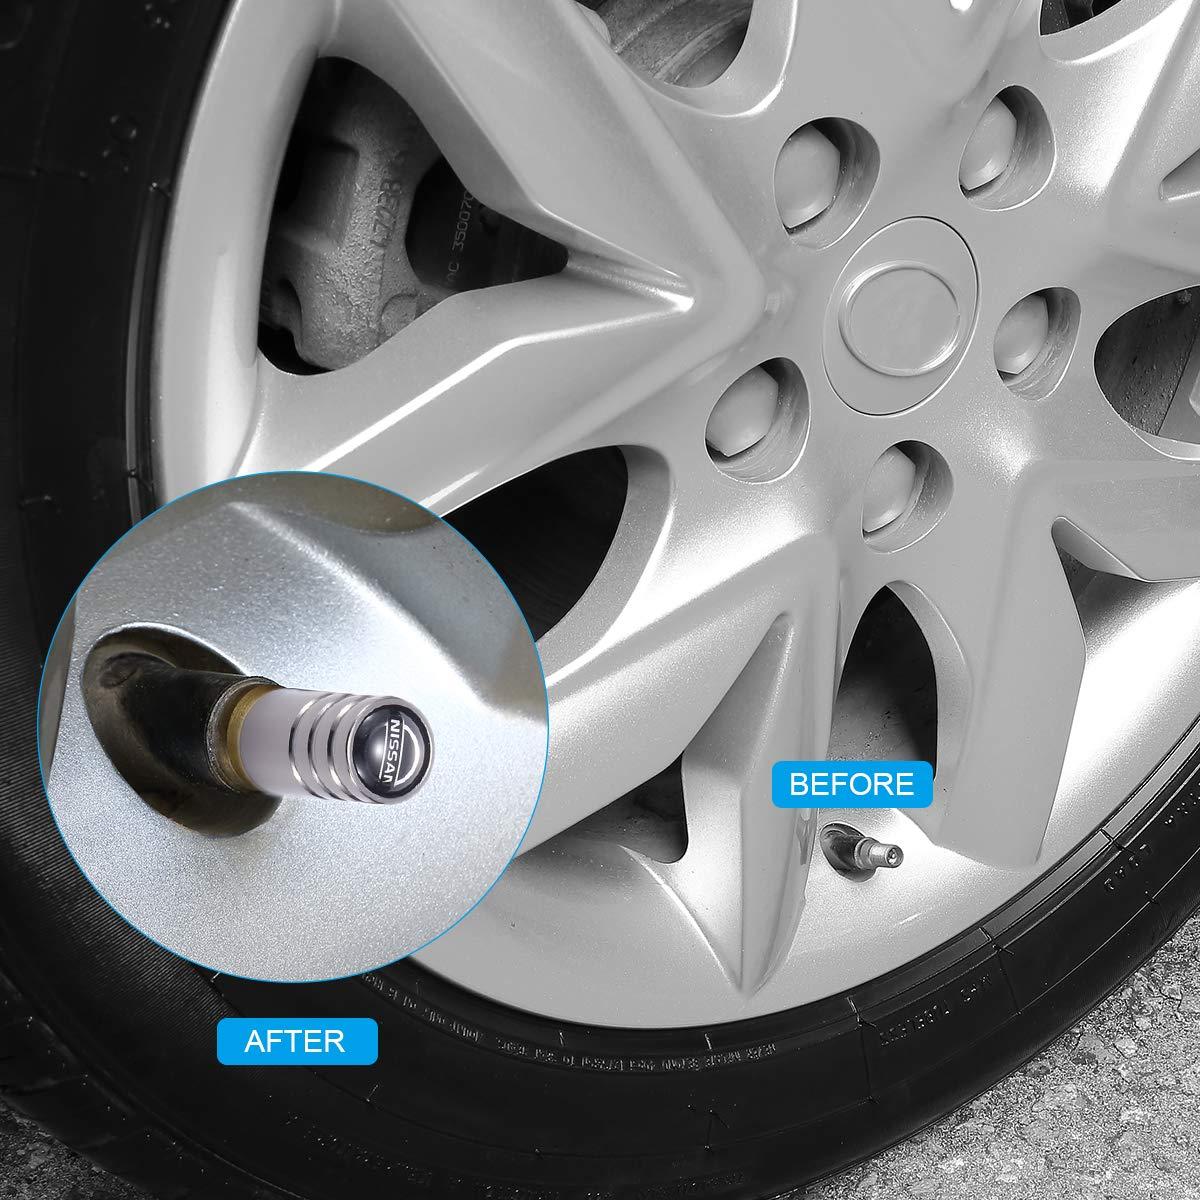 TK-KLZ 5Pcs Chrome Car Tire Valve Stem Caps for Nissan TEANA Qashqai TIDA Patrol Bluebird Decorative Accessory